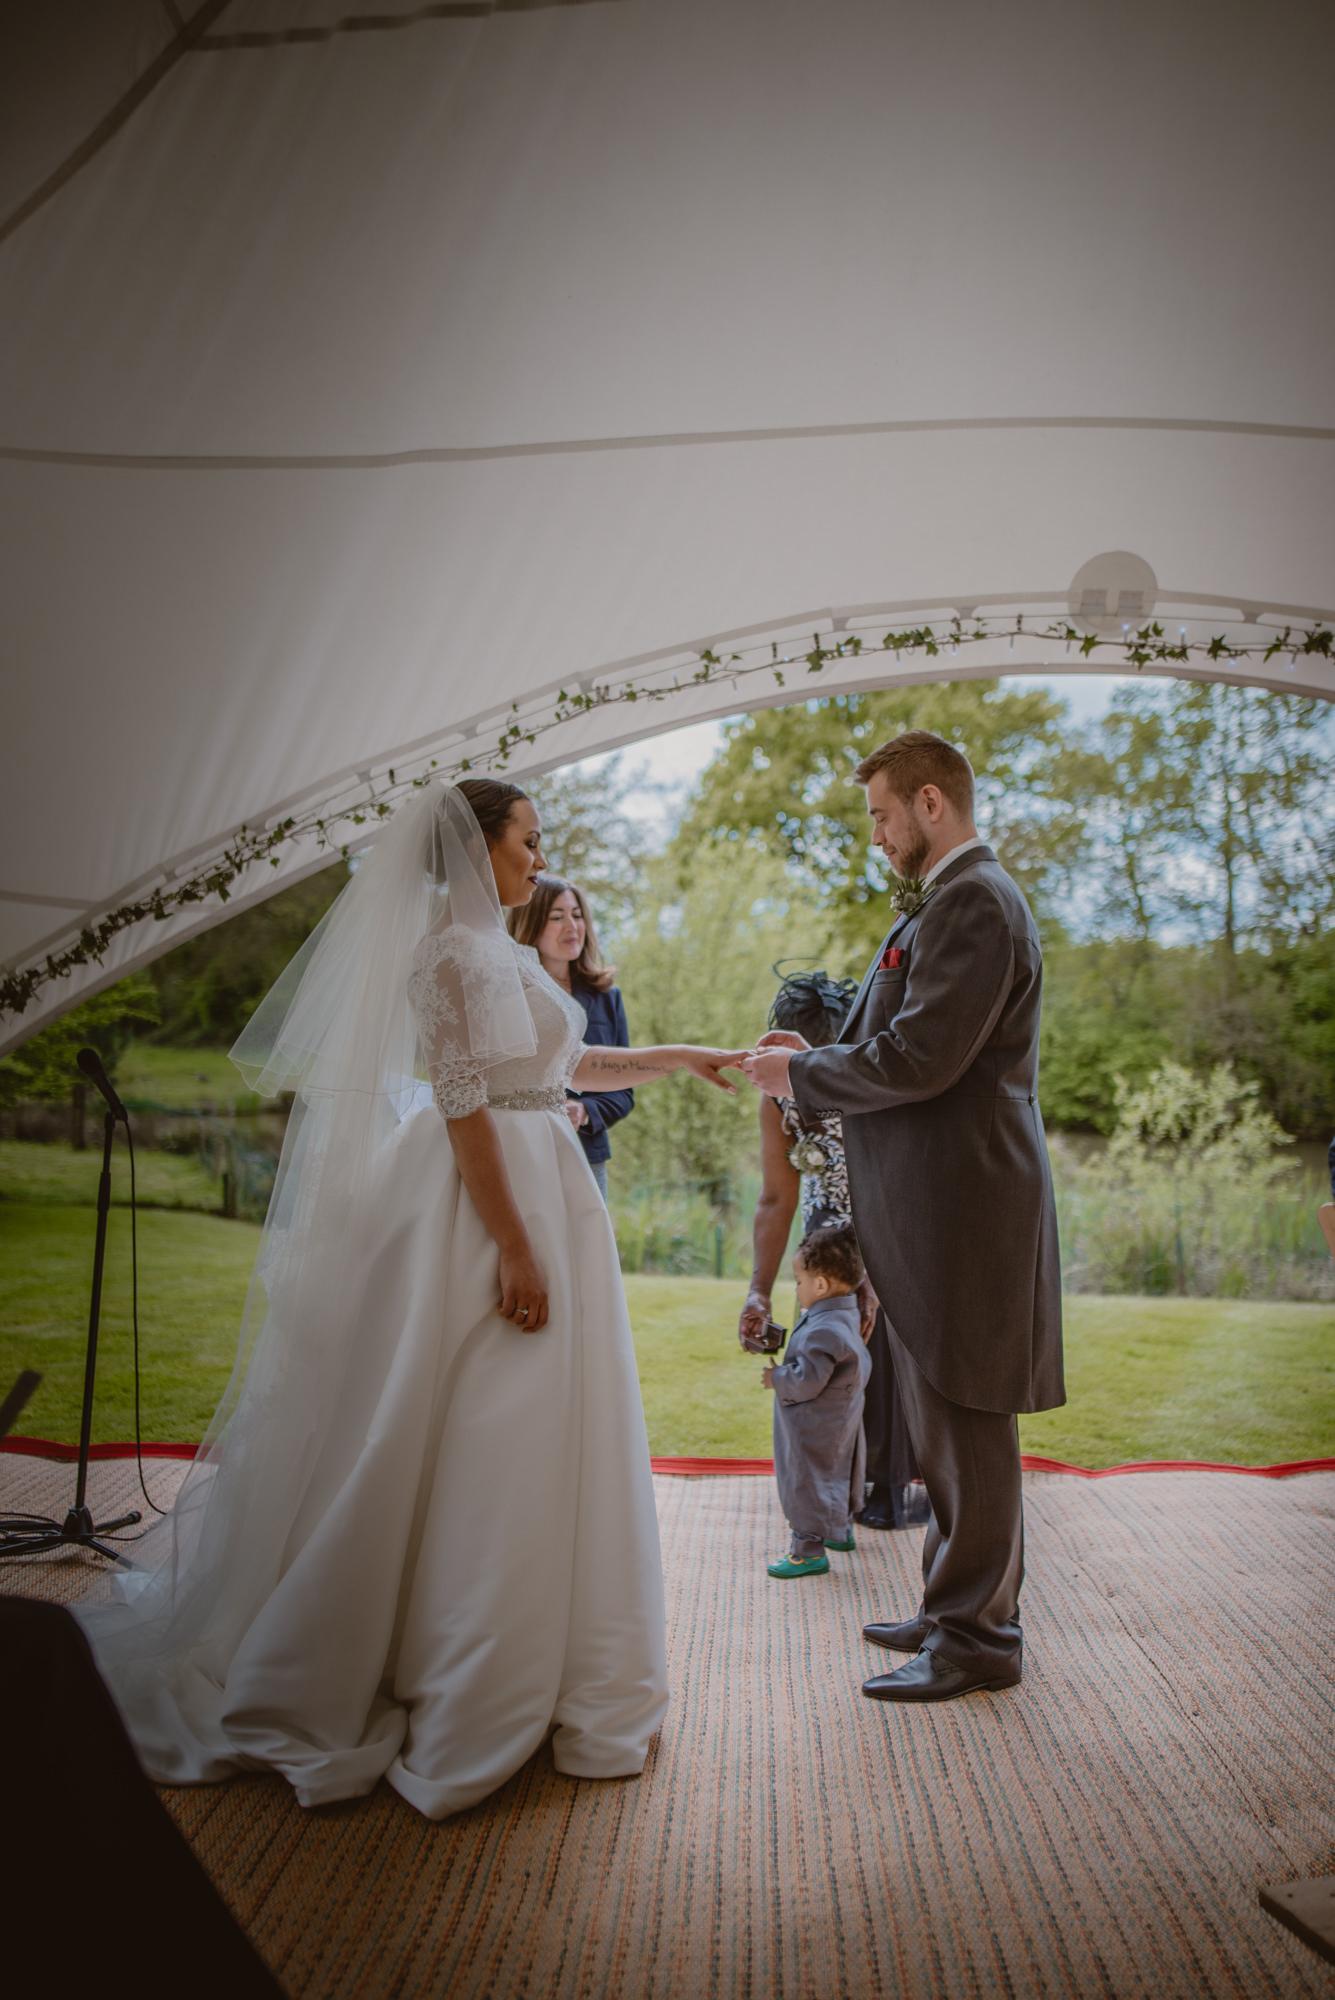 Jacqueline-Gareth-Wedding-Westmead-Events-Surrey-Manu-Mendoza-Wedding-Photography-247.jpg